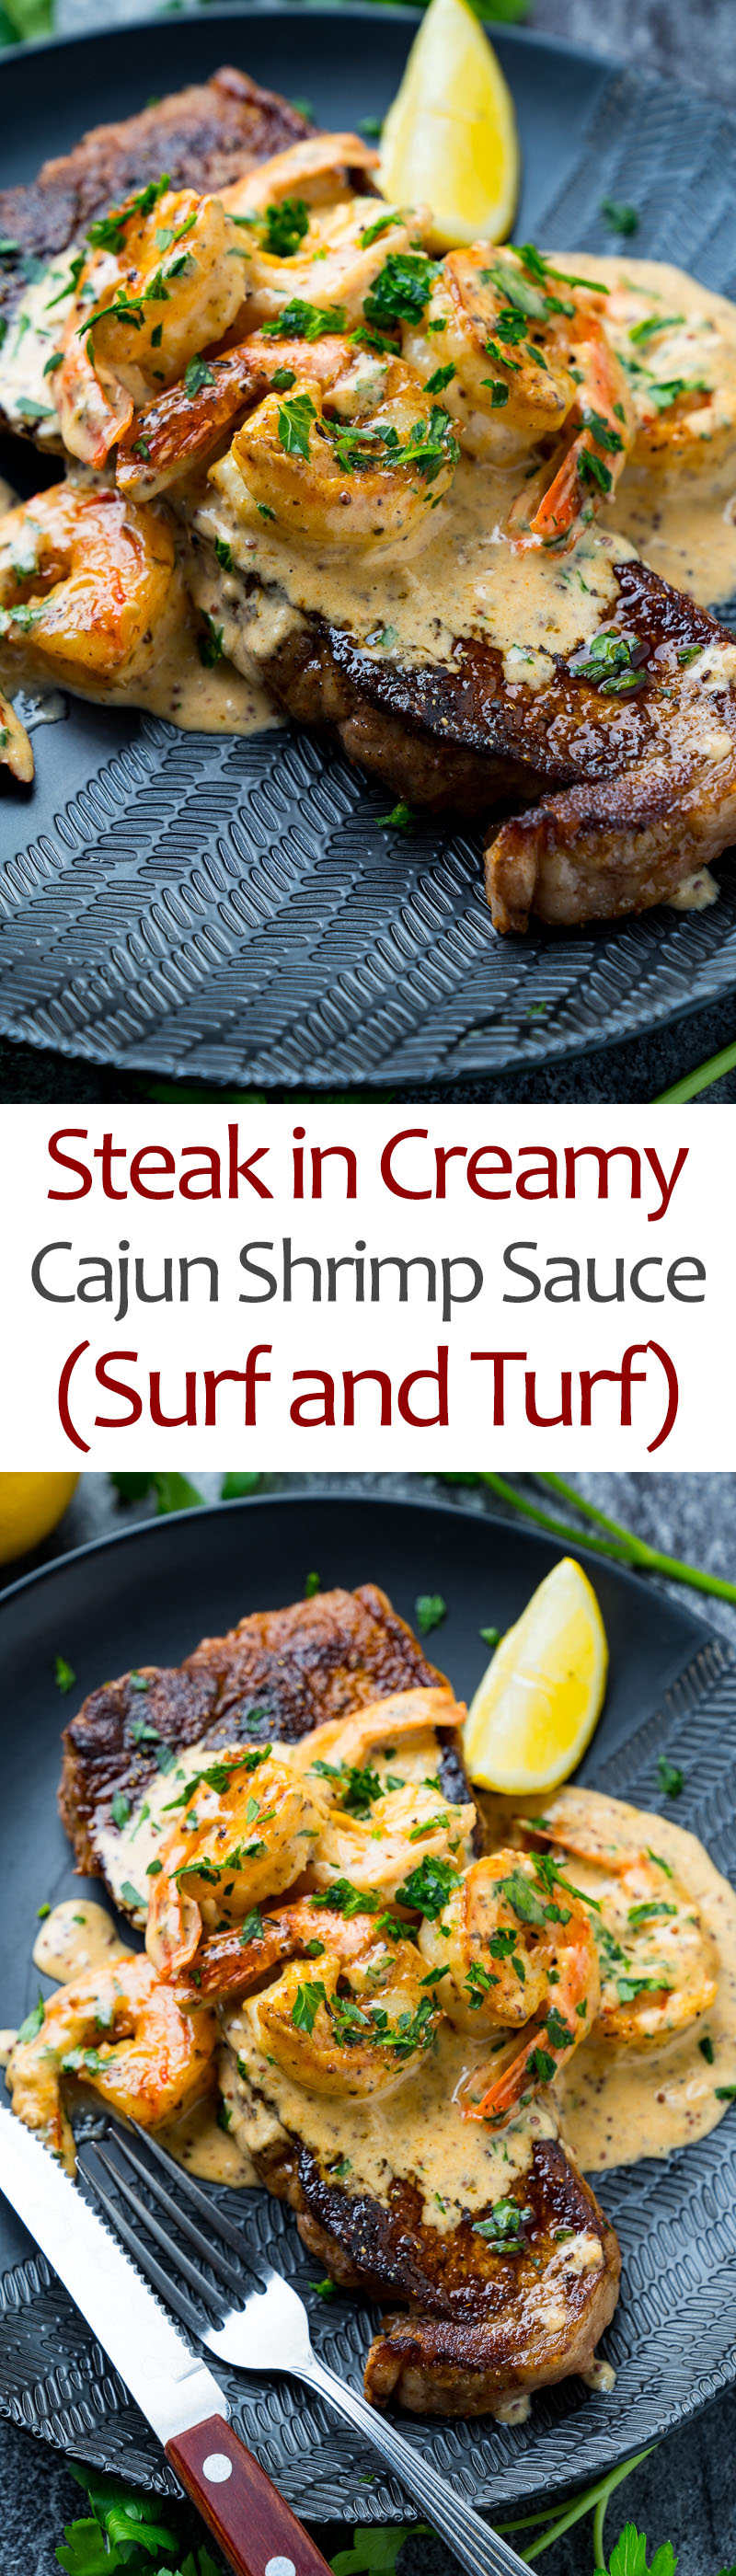 Steak in Creamy Cajun Shrimp Sauce (Surf and Turf)